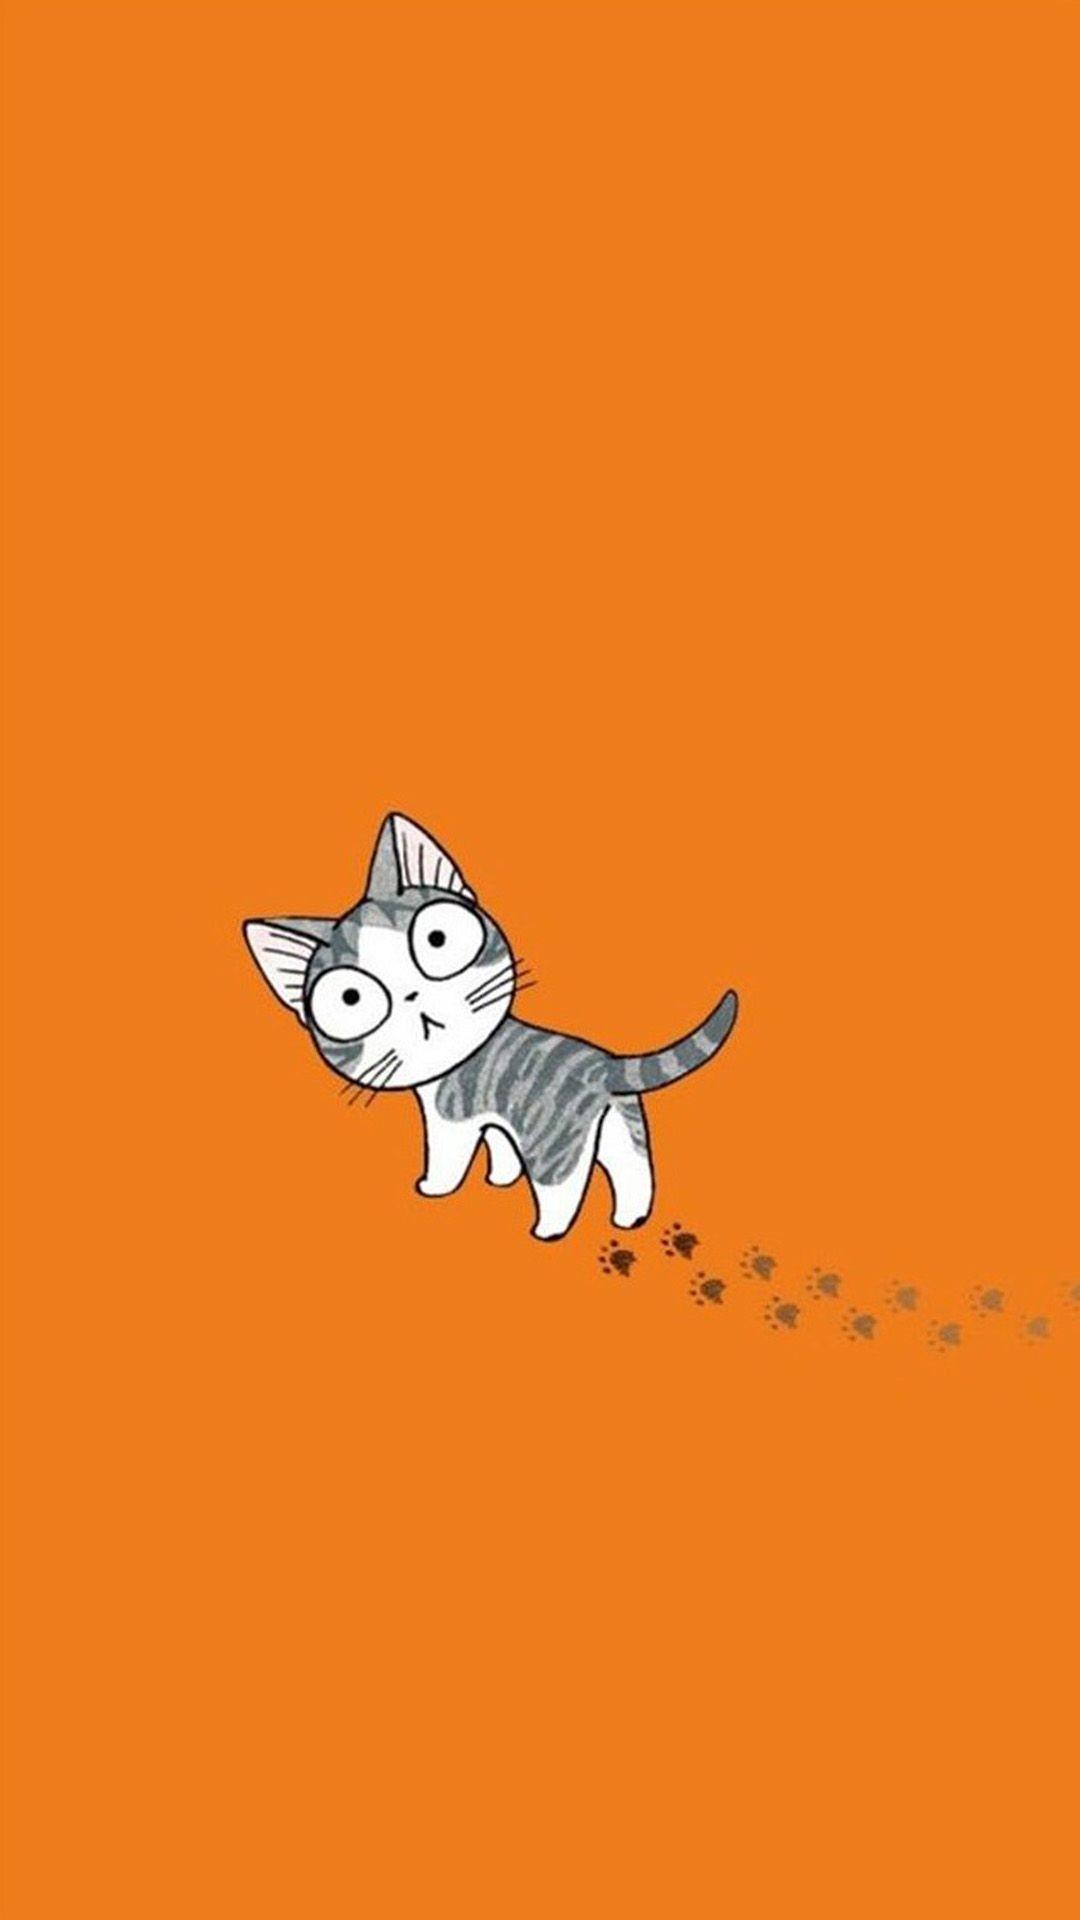 Cute Cat Cartoon 03 Galaxy S5 Wallpapers – PowerballForLife